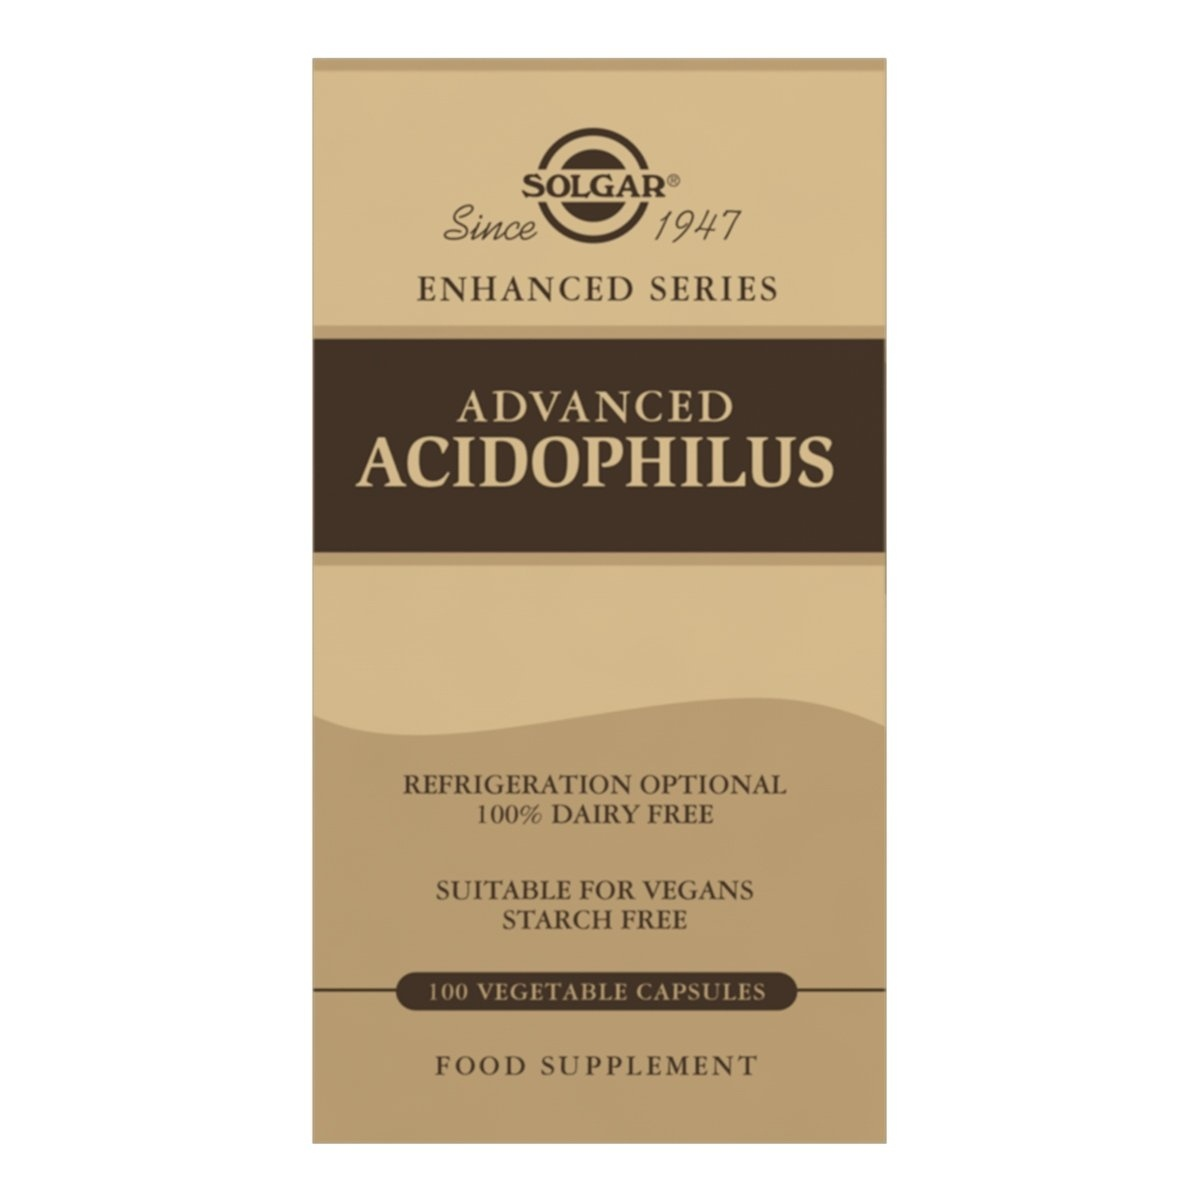 Solgar Advanced Acidophilus Vegetable Capsules - Pack of 100